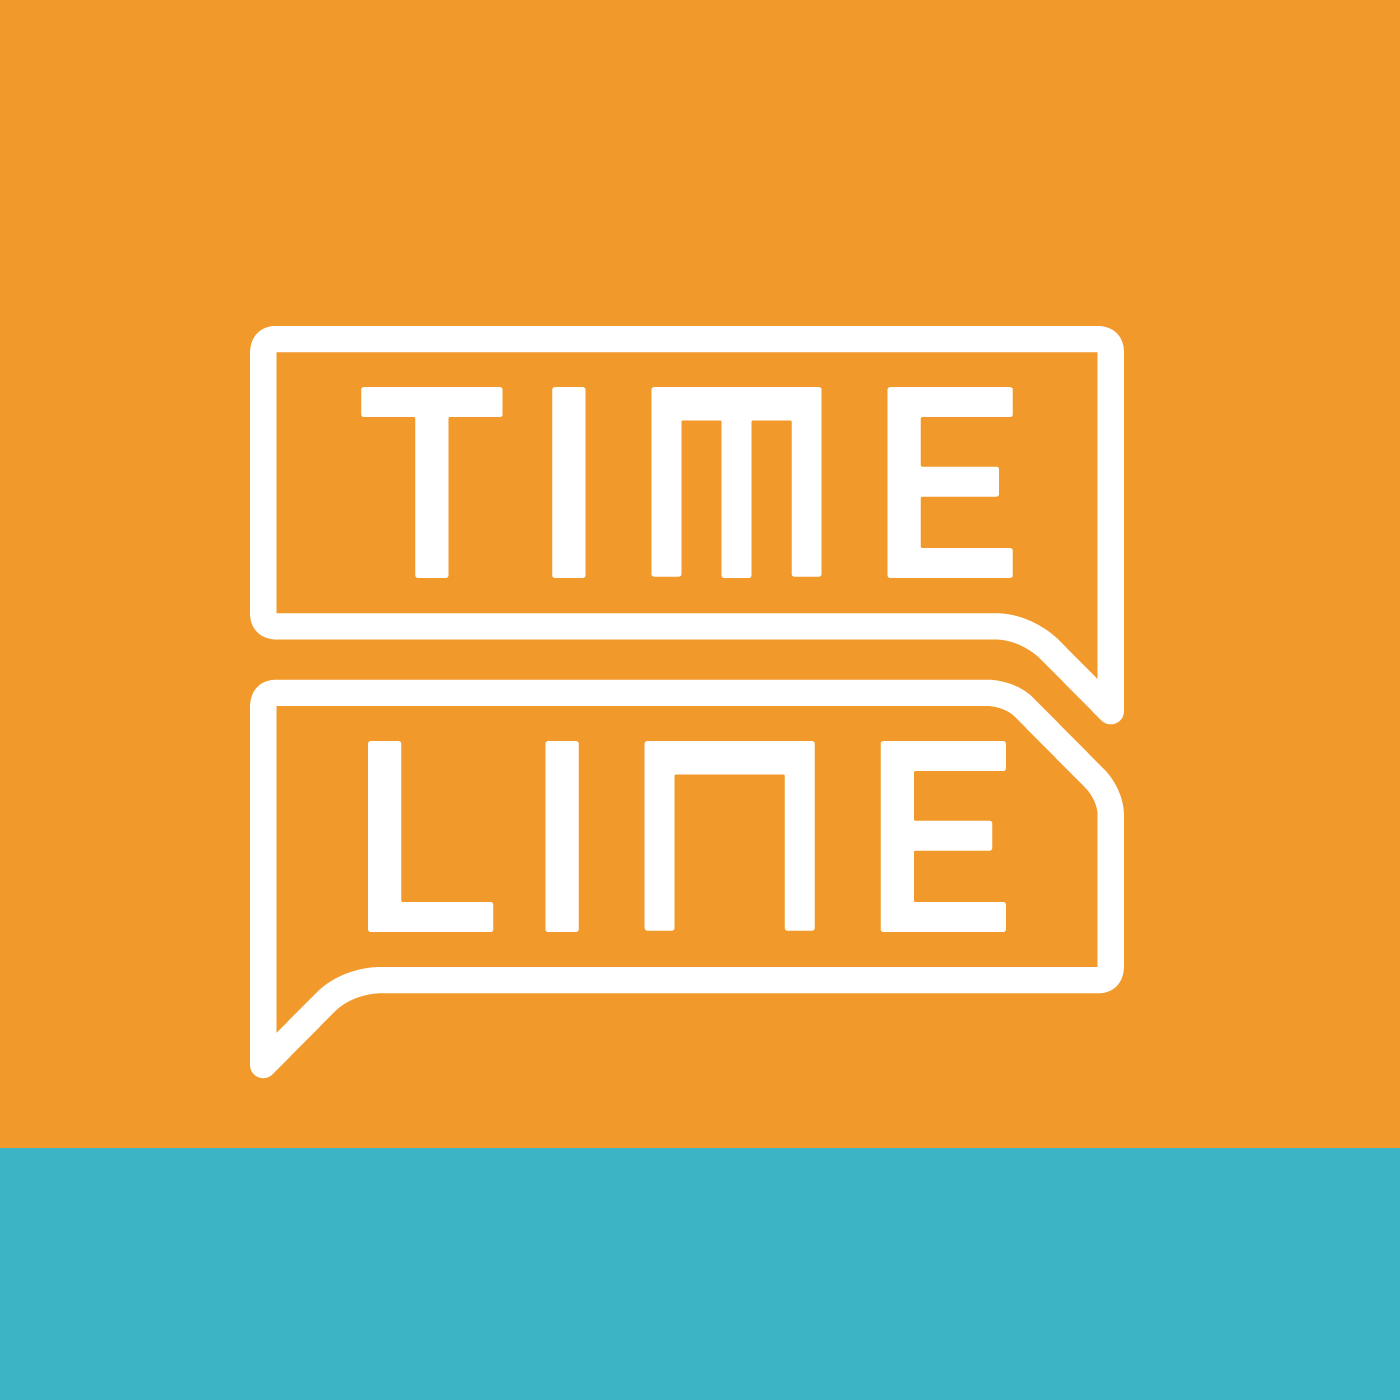 Timeline Ga�cha - 20/10/2016